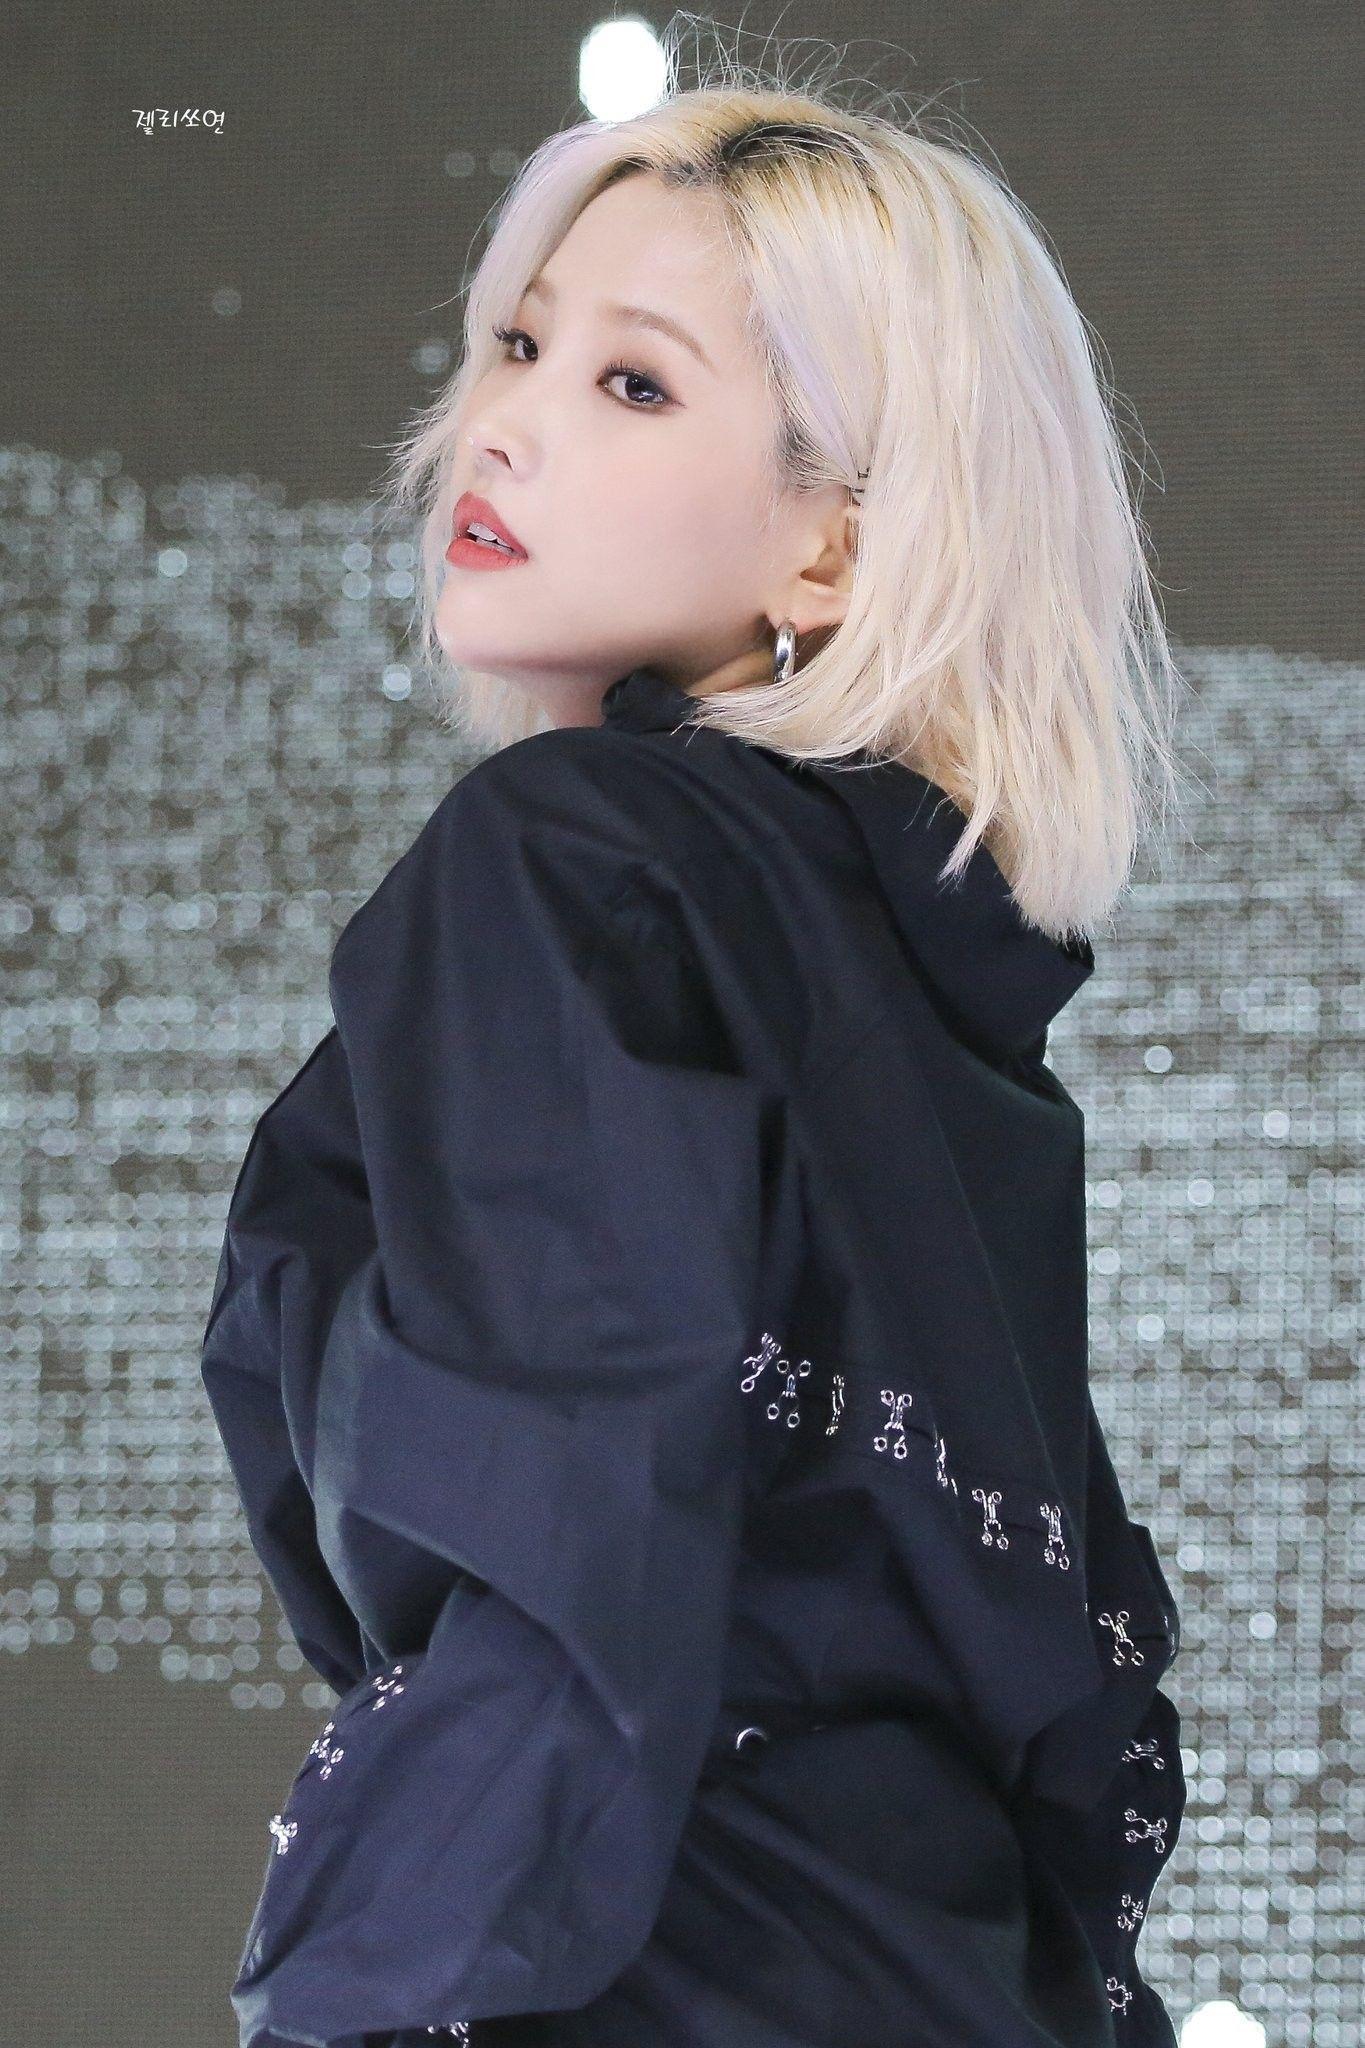 Pin By Taetae 95 On G Idle Kpop Girls Kpop Girl Groups Girl